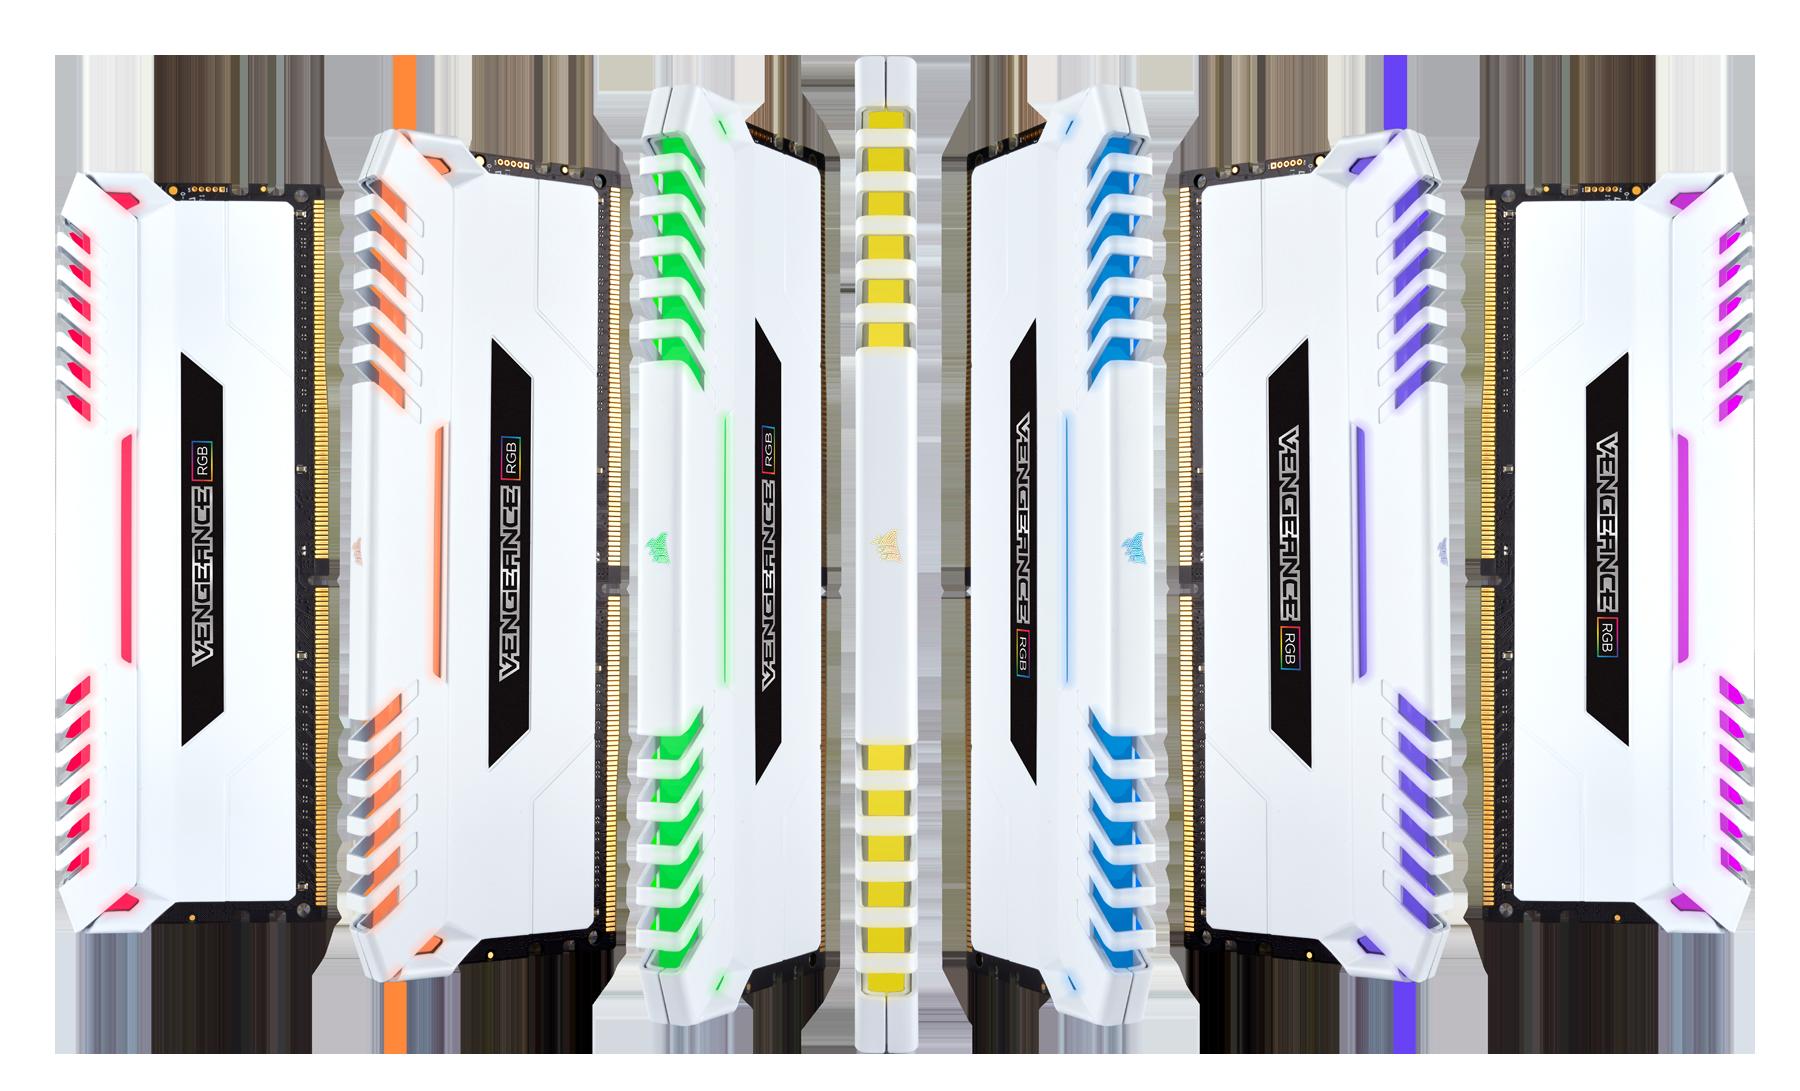 RAM] Corsair จัดแรมชุดใหญ่ ไฟกระพริบ VENGEANCE RGB สายโมฯ ต้องจัด